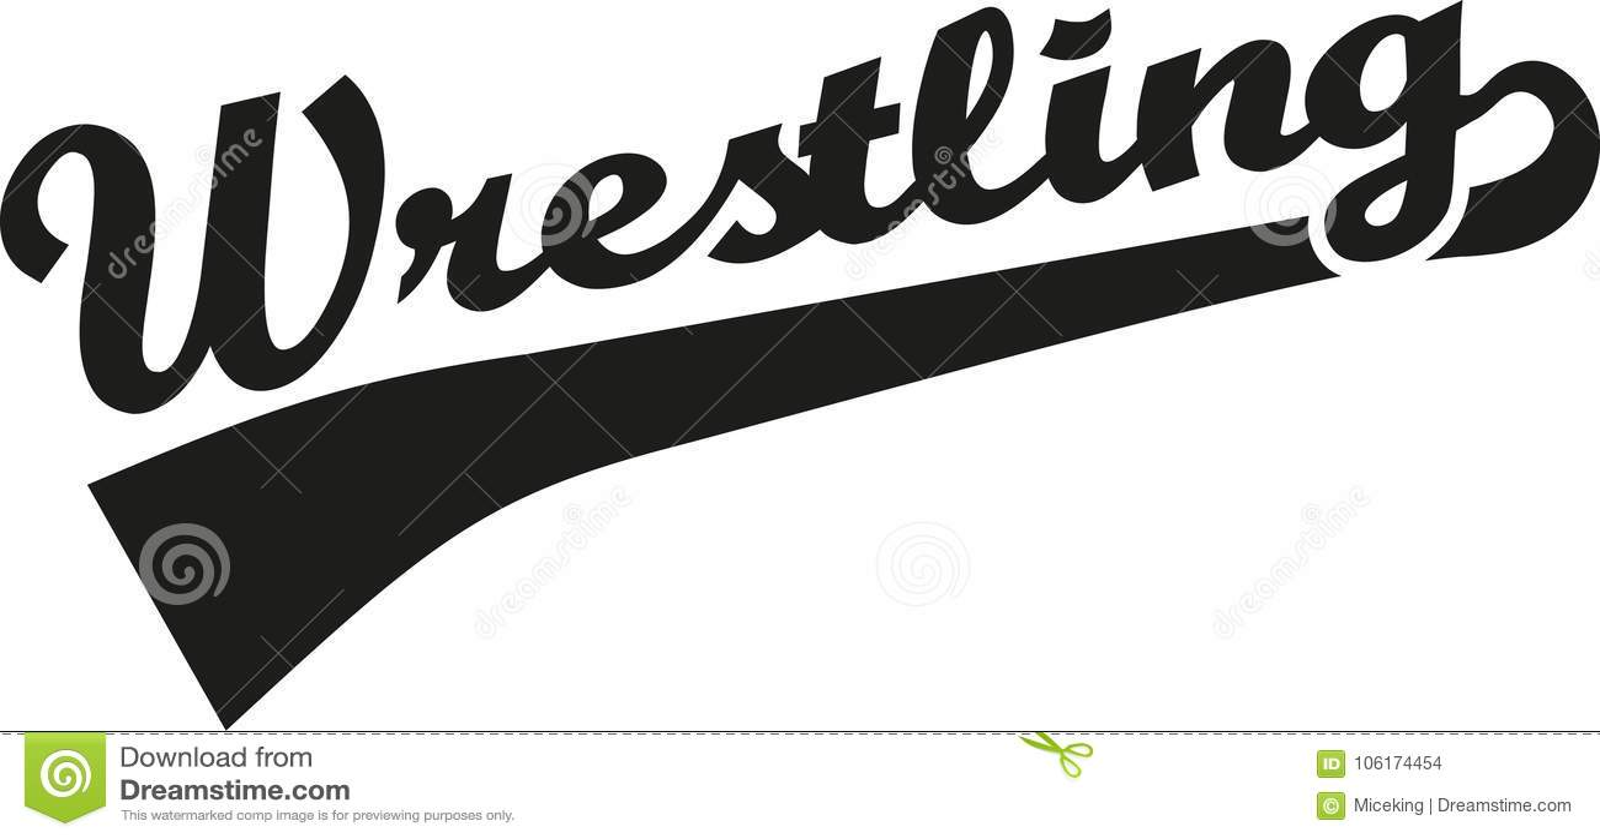 Wrestling Word Stock Vector Illustration Of Calligraphic 106174454